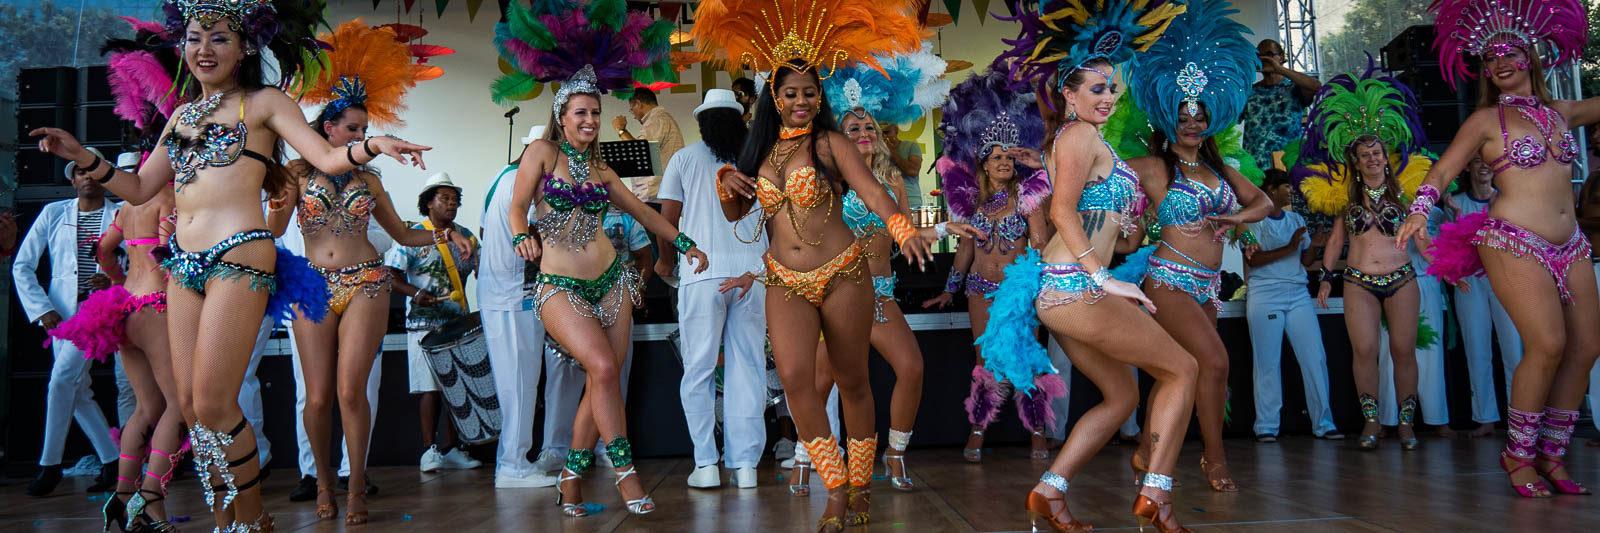 Samba dancers at Auckland Latin Festival